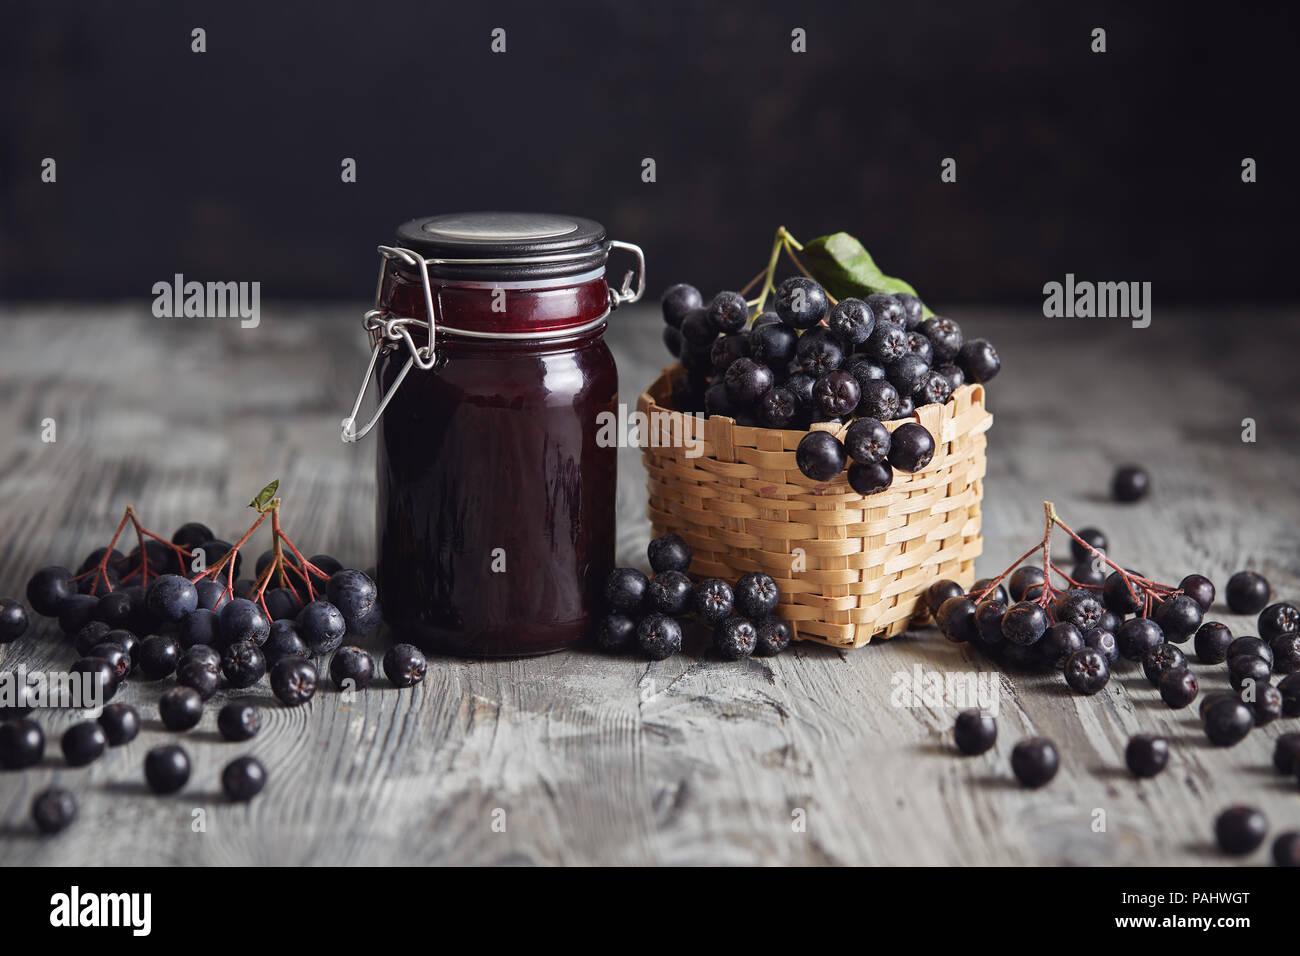 Aronia jam next to fresh berries. Homemade aronia jam in glass jar with fresh aronia berries on wooden table. - Stock Image